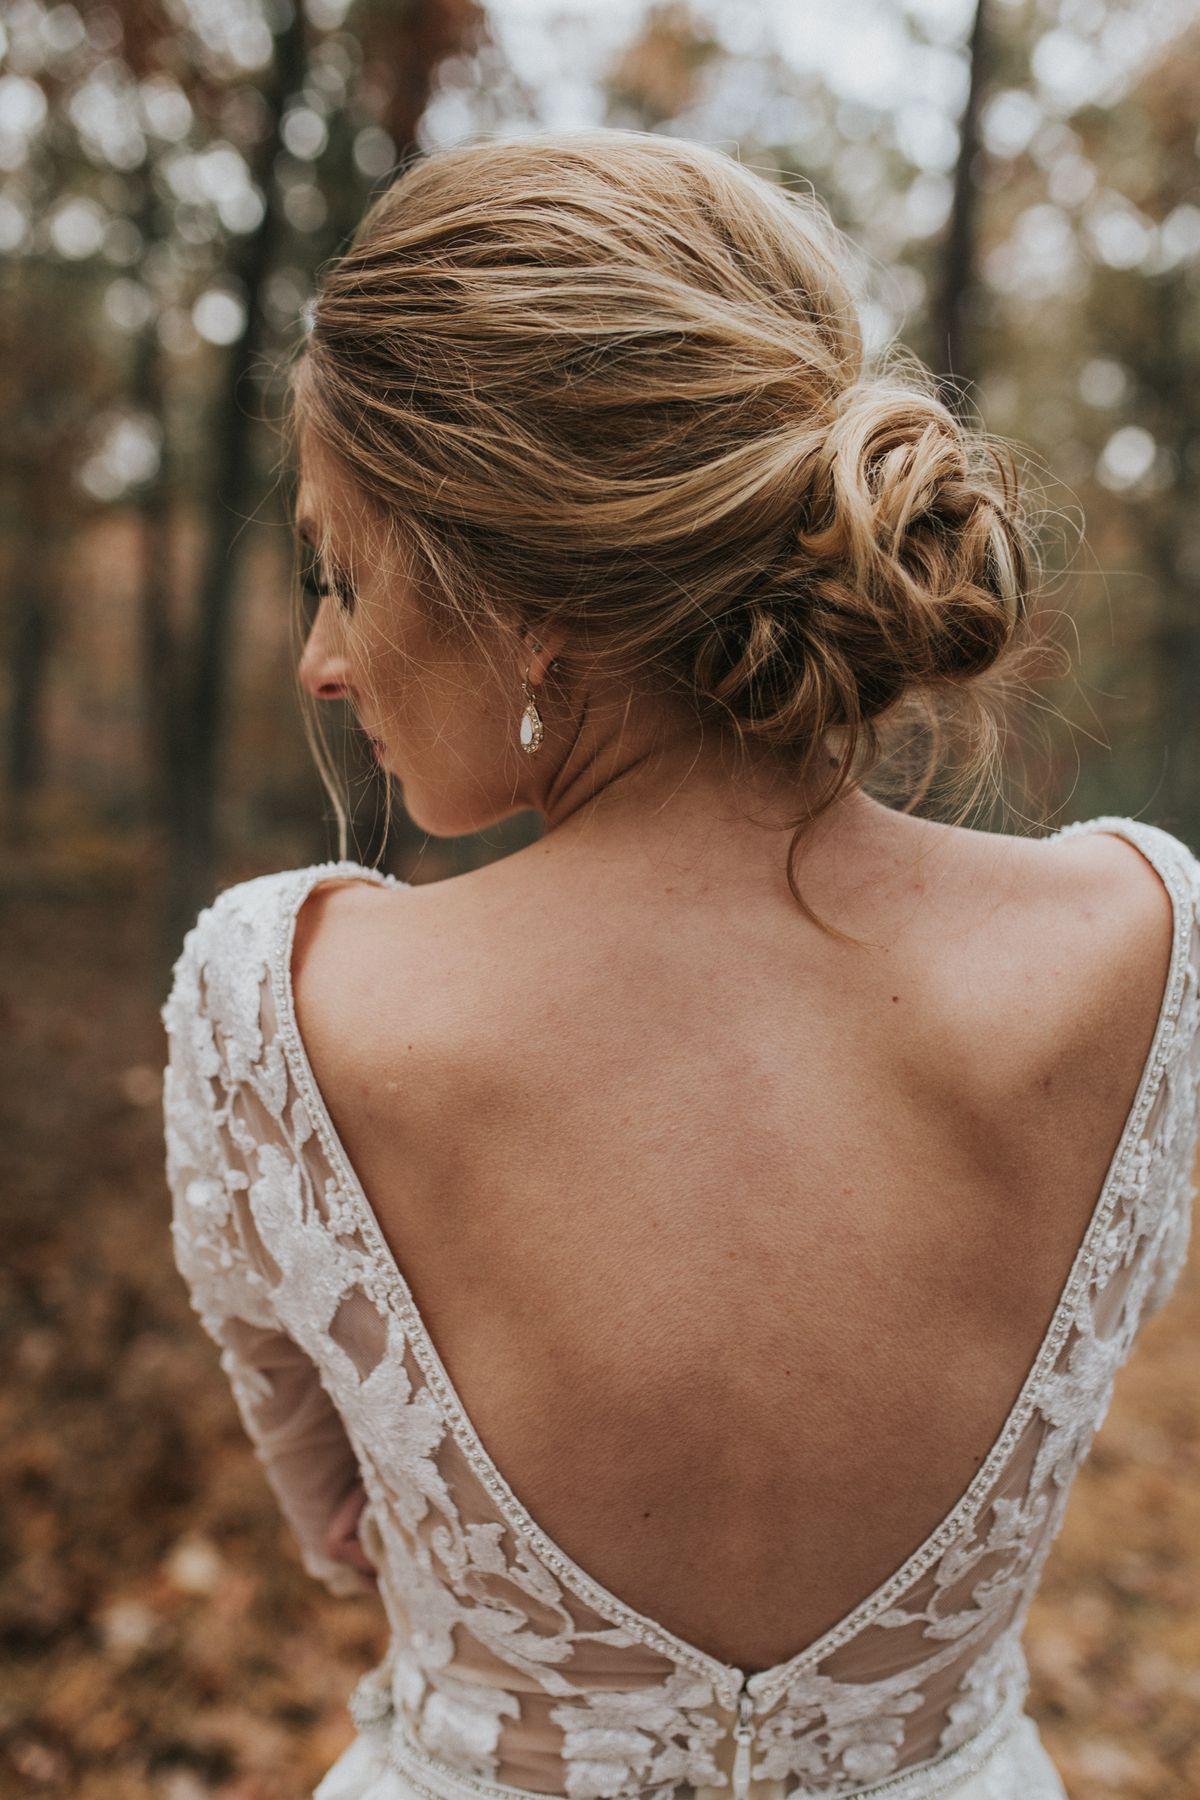 Tori_Kelner_Photography_Styled_Shoot_Sneak_Peek-10.jpg